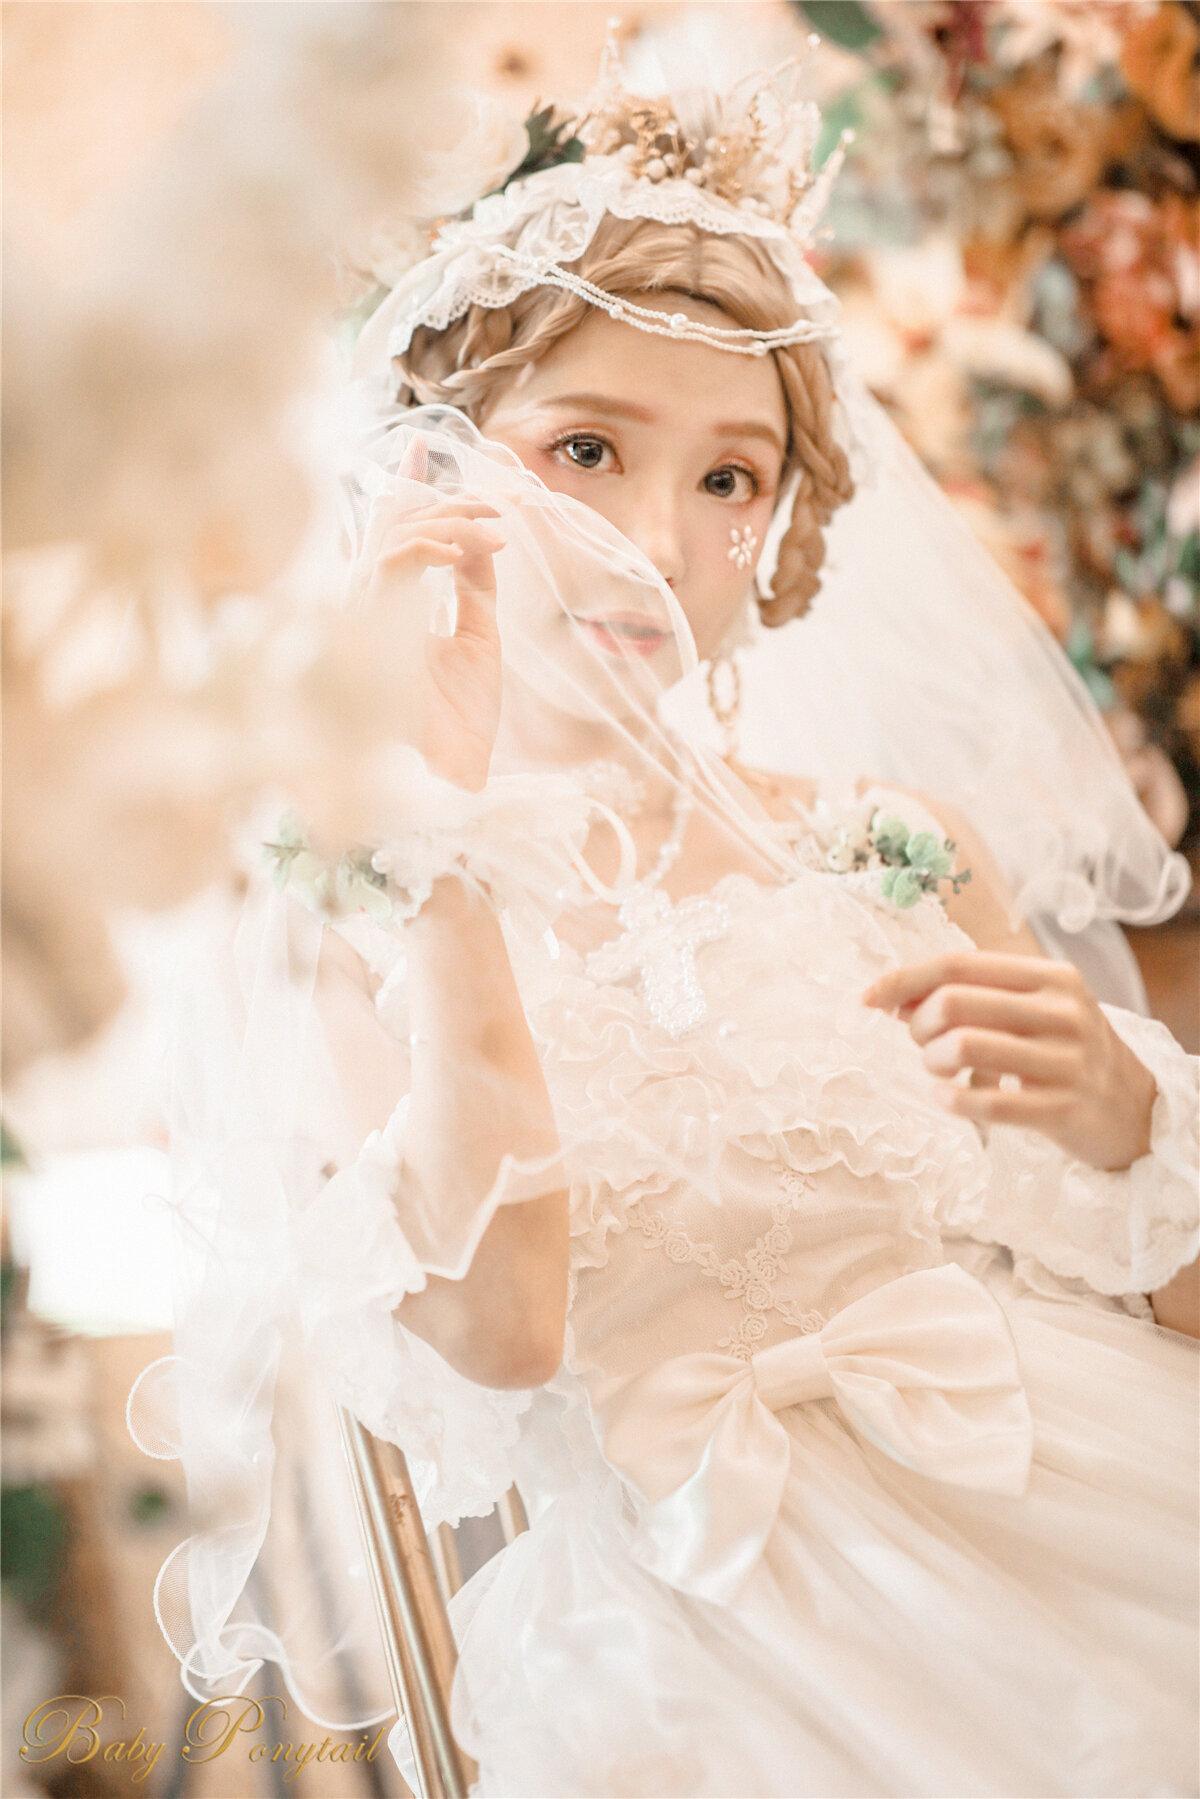 Babyponytail_Heavenly Teardrops_Model photo_JSK white_kaka_12.jpg